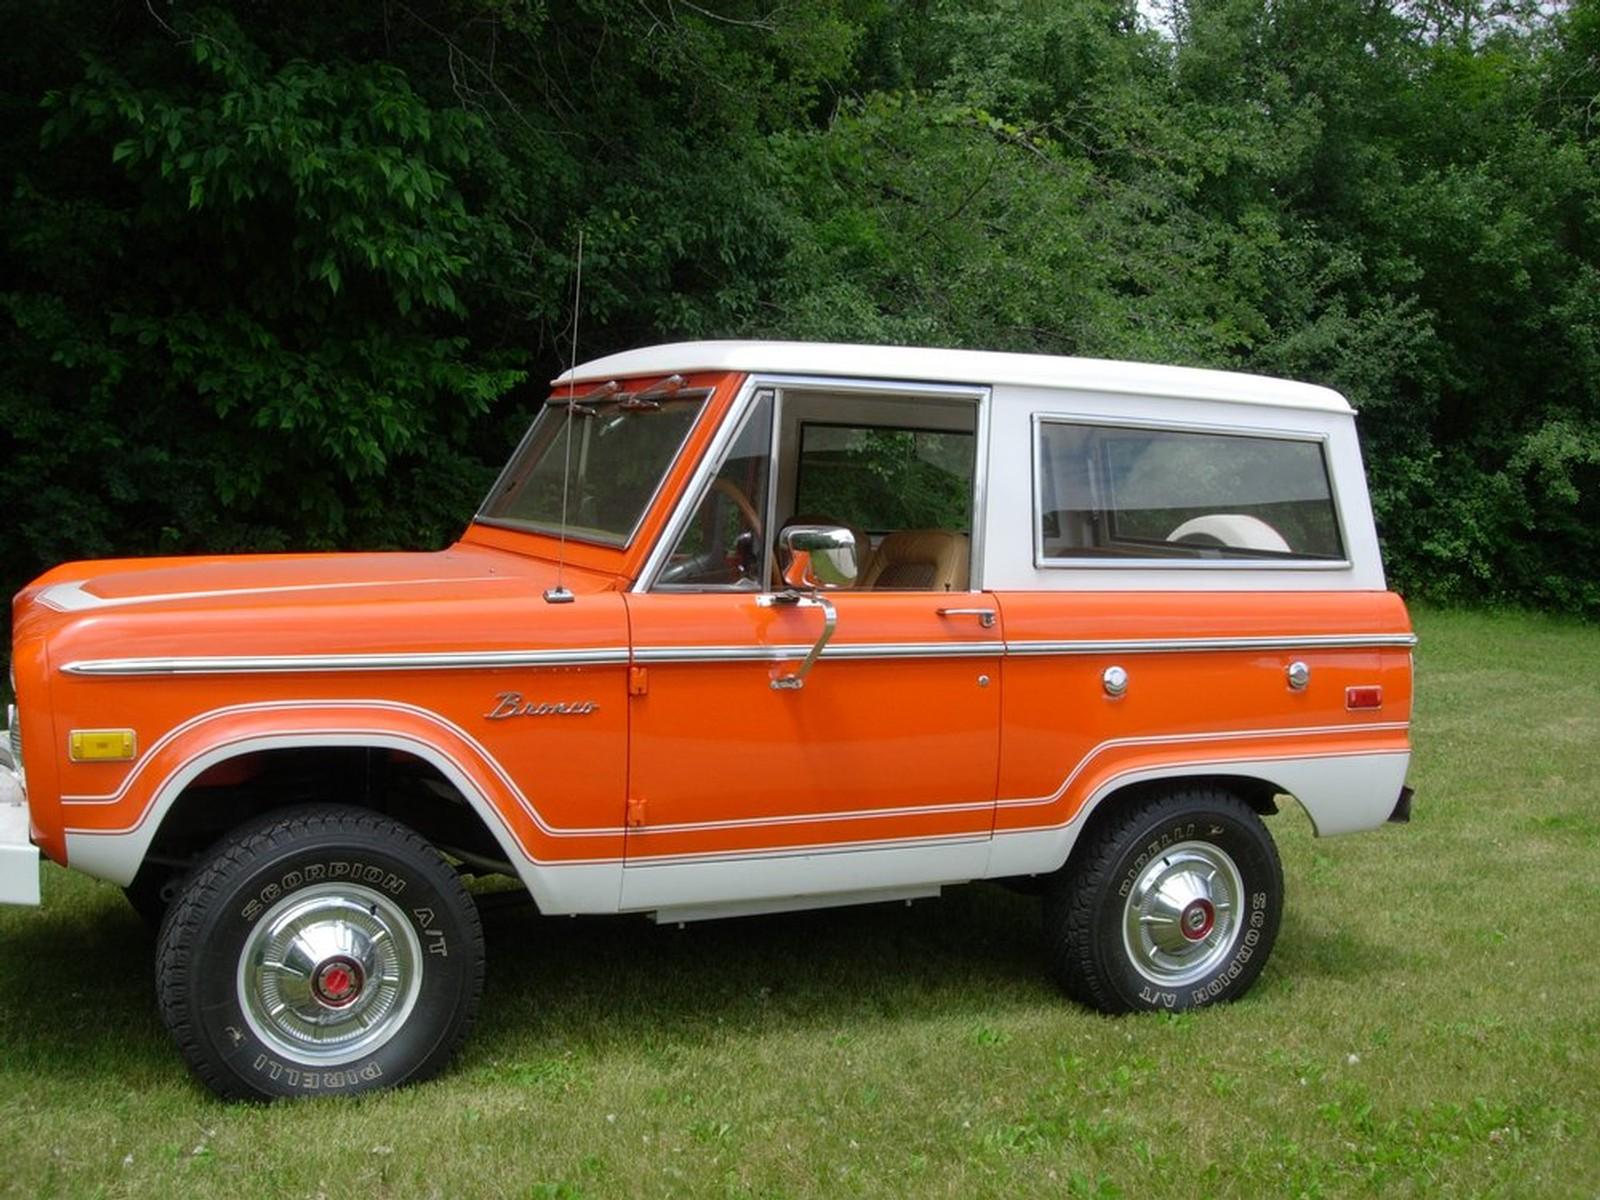 JWS Classic Cars in Wisconsin